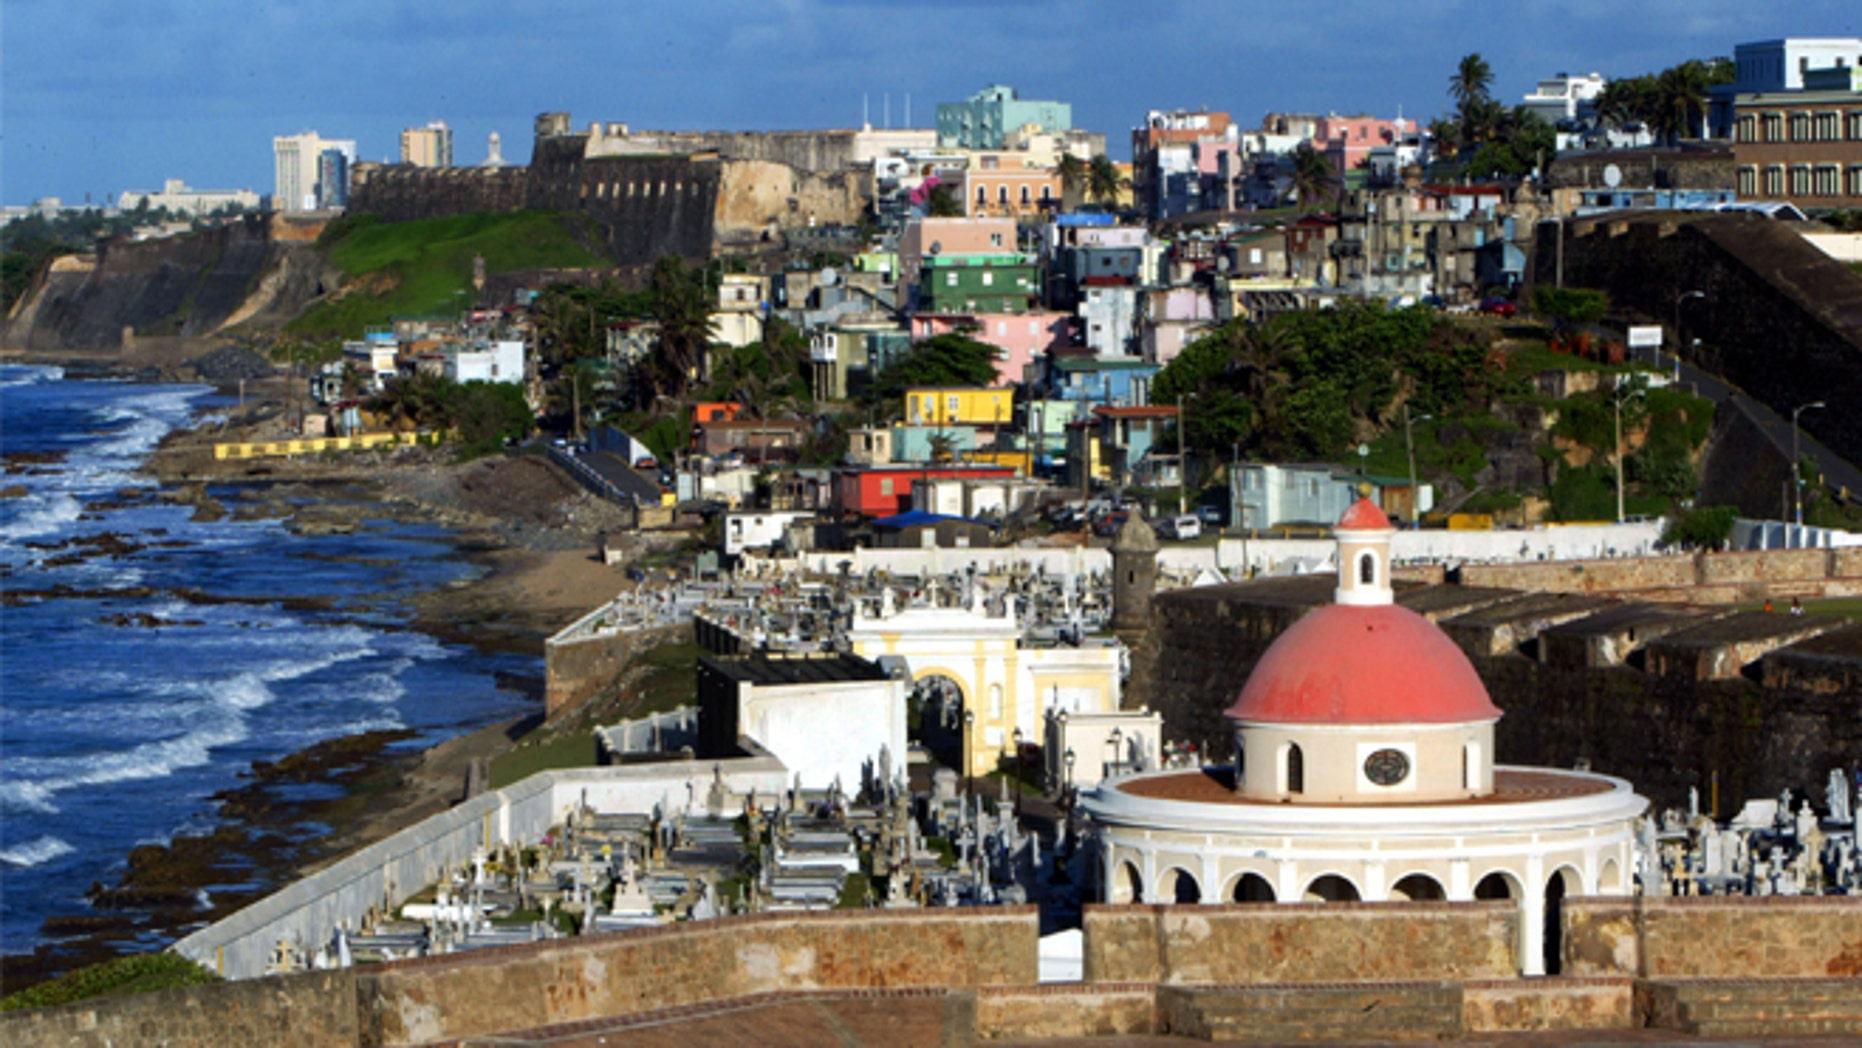 San Juan, Puerto Rico. (Photo: Getty images)